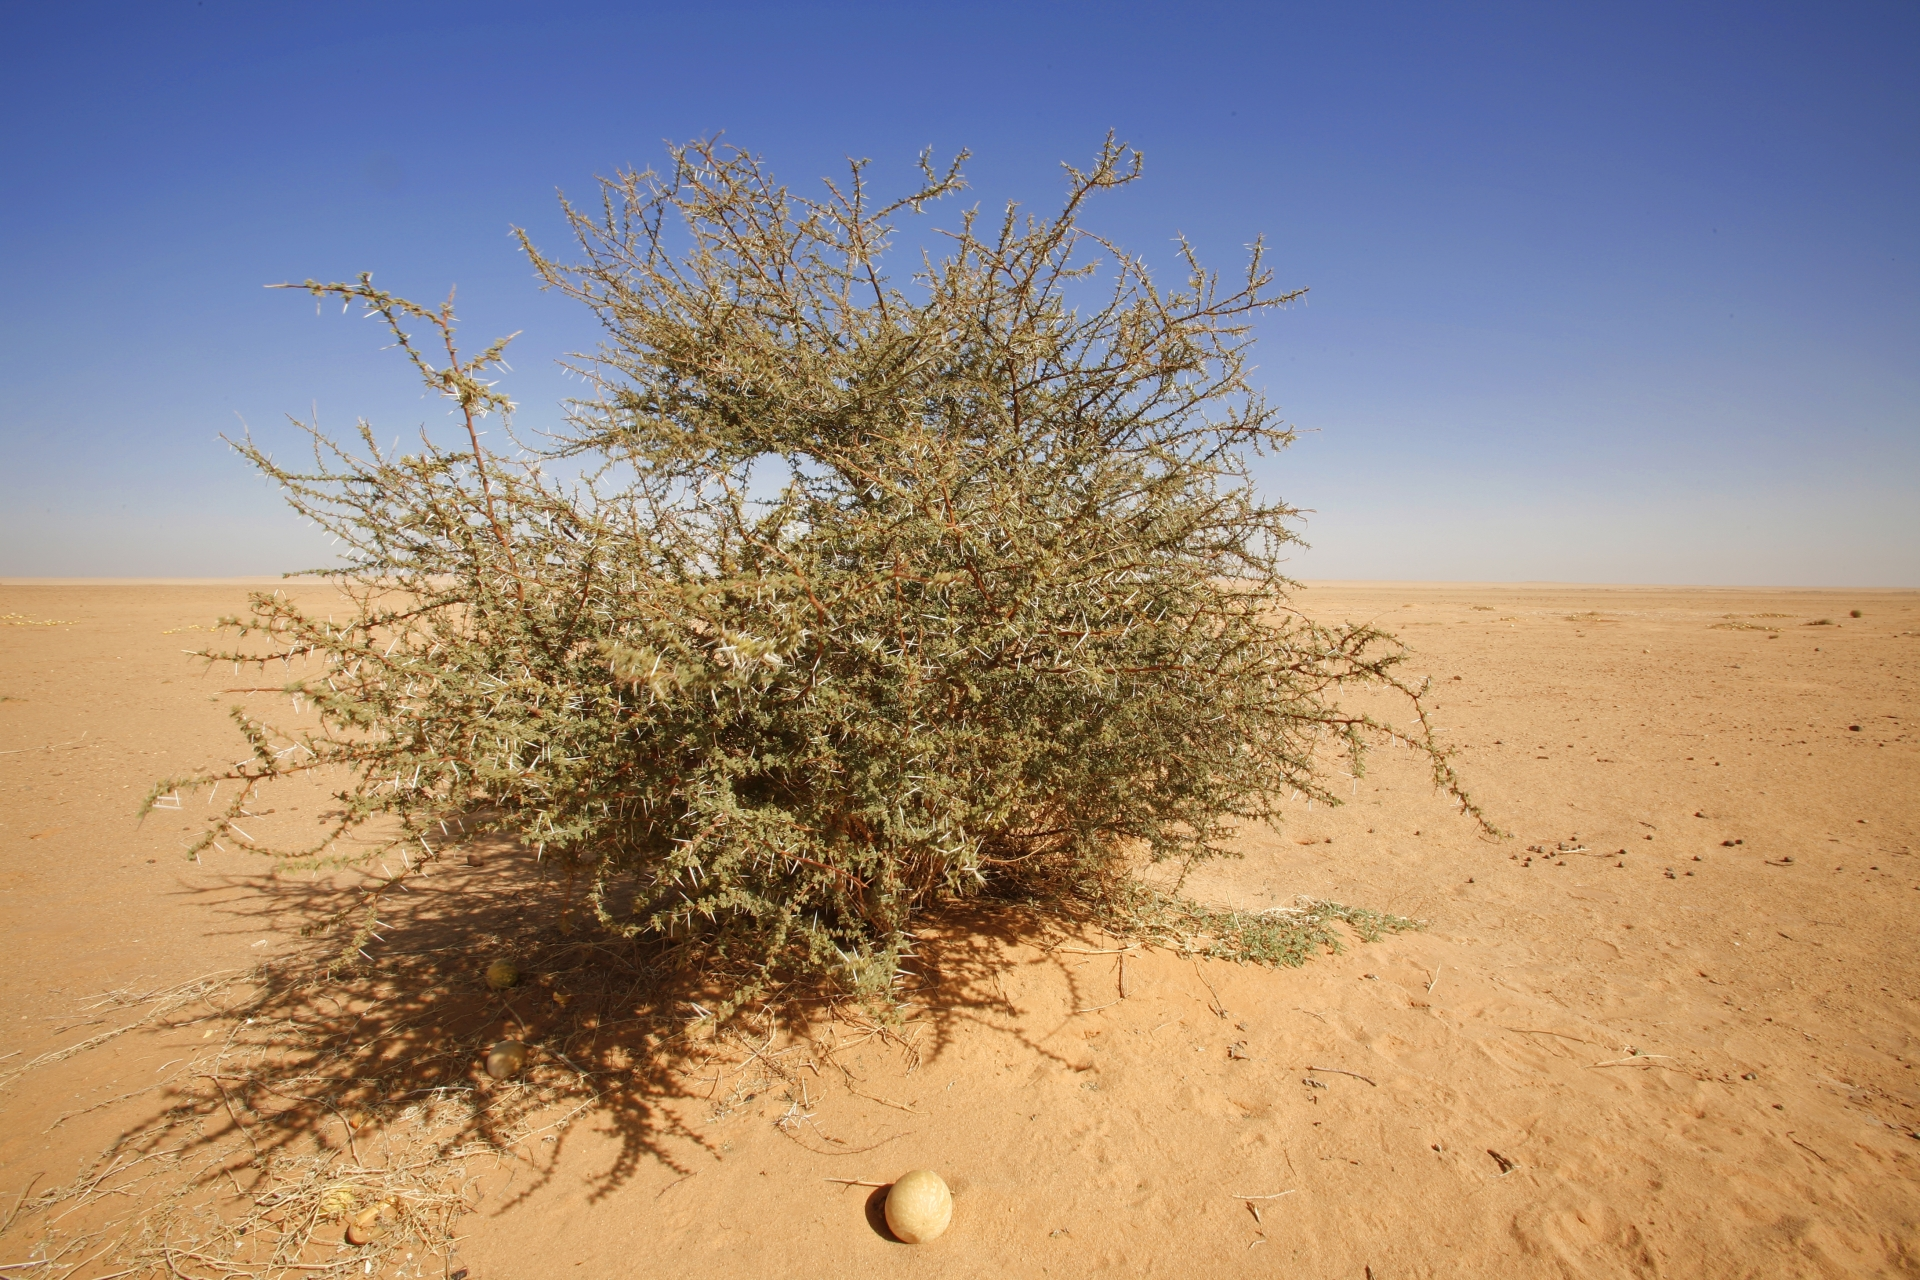 Libya 2007 # 05